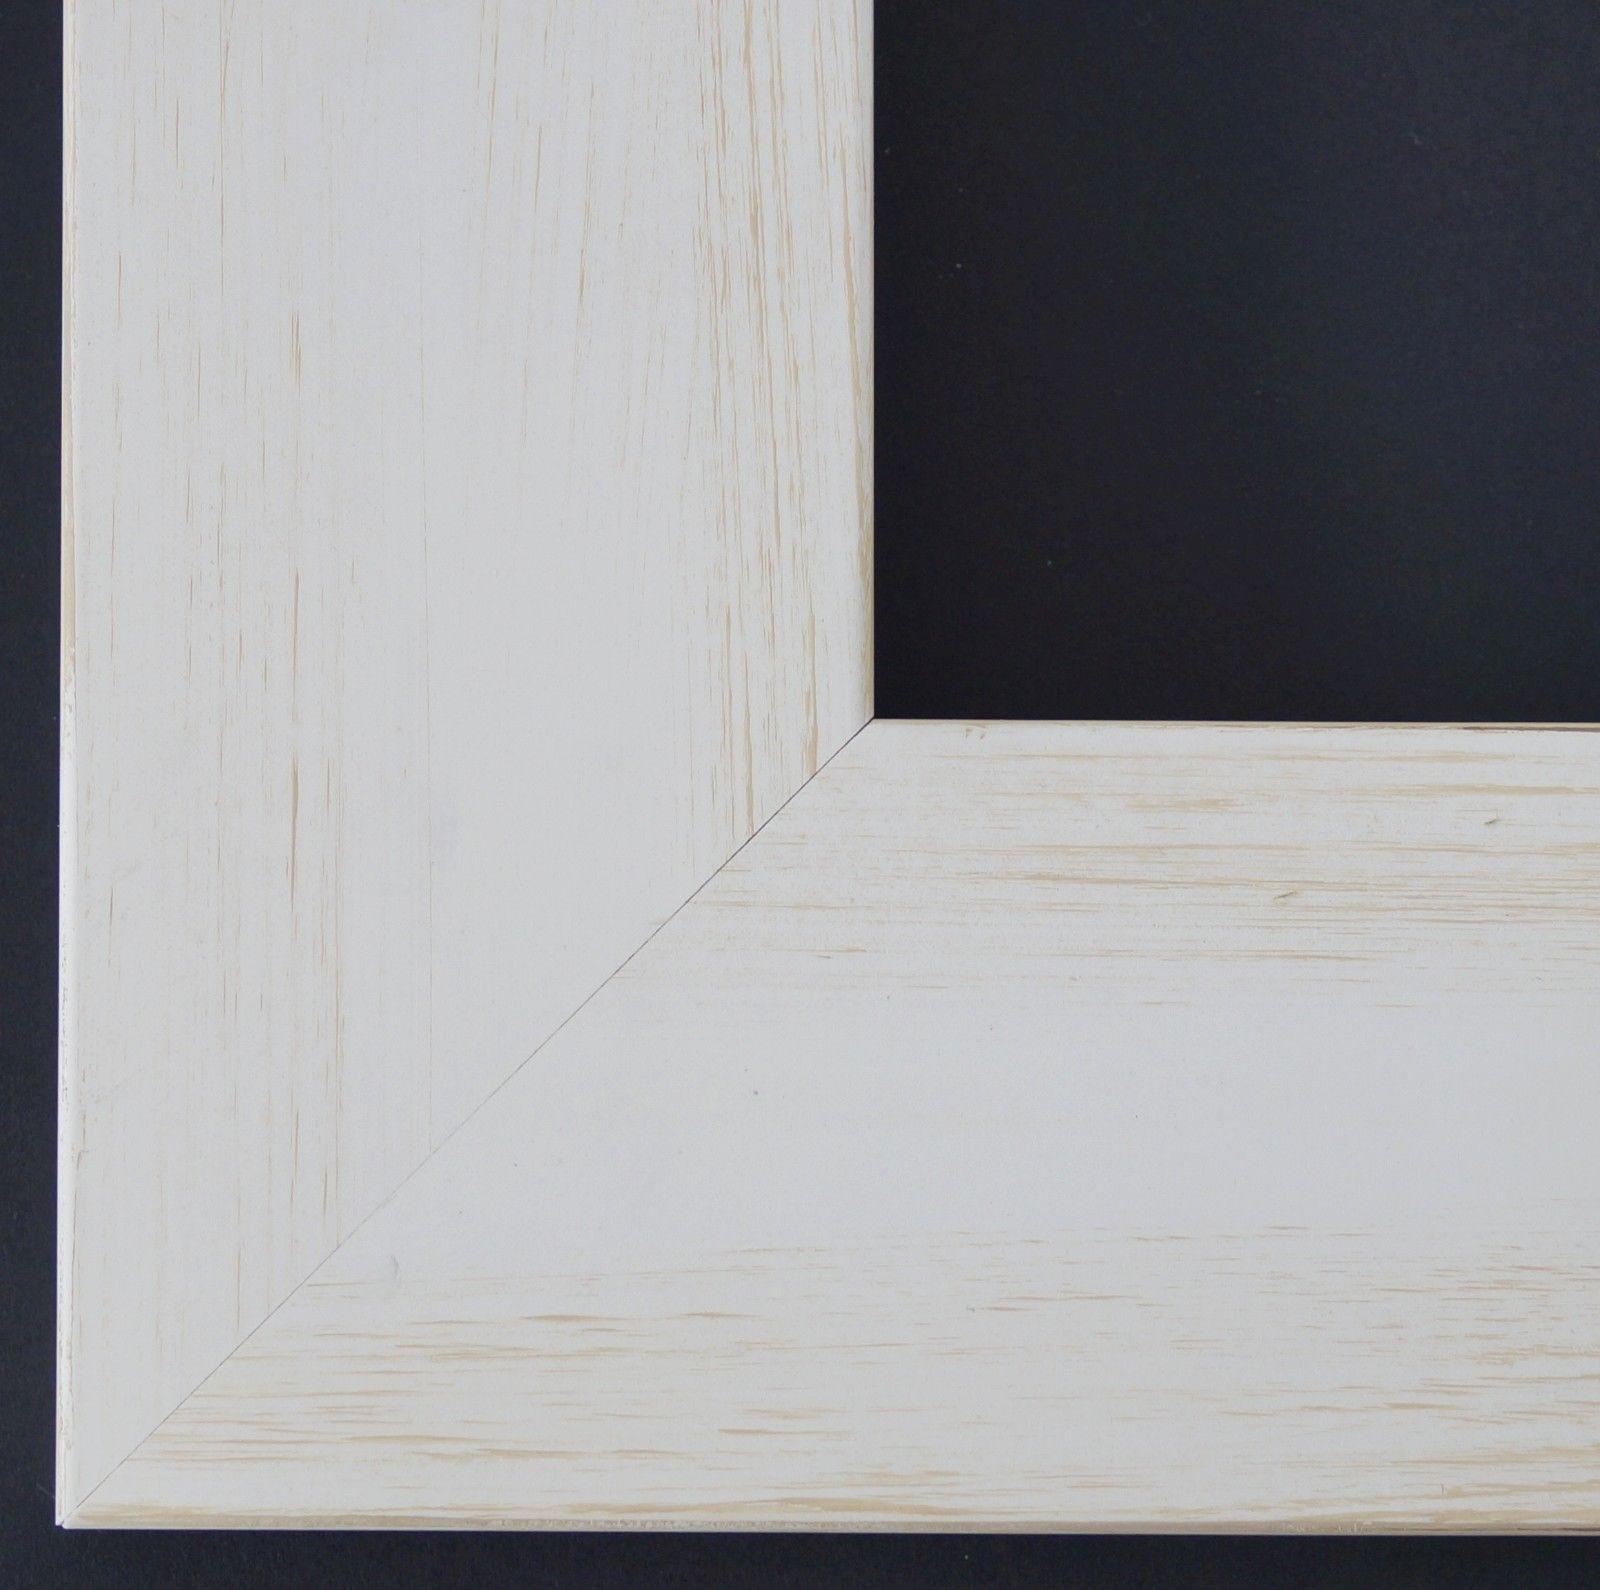 Großartig A2 Weiß Bilderrahmen Zeitgenössisch - Bilderrahmen Ideen ...